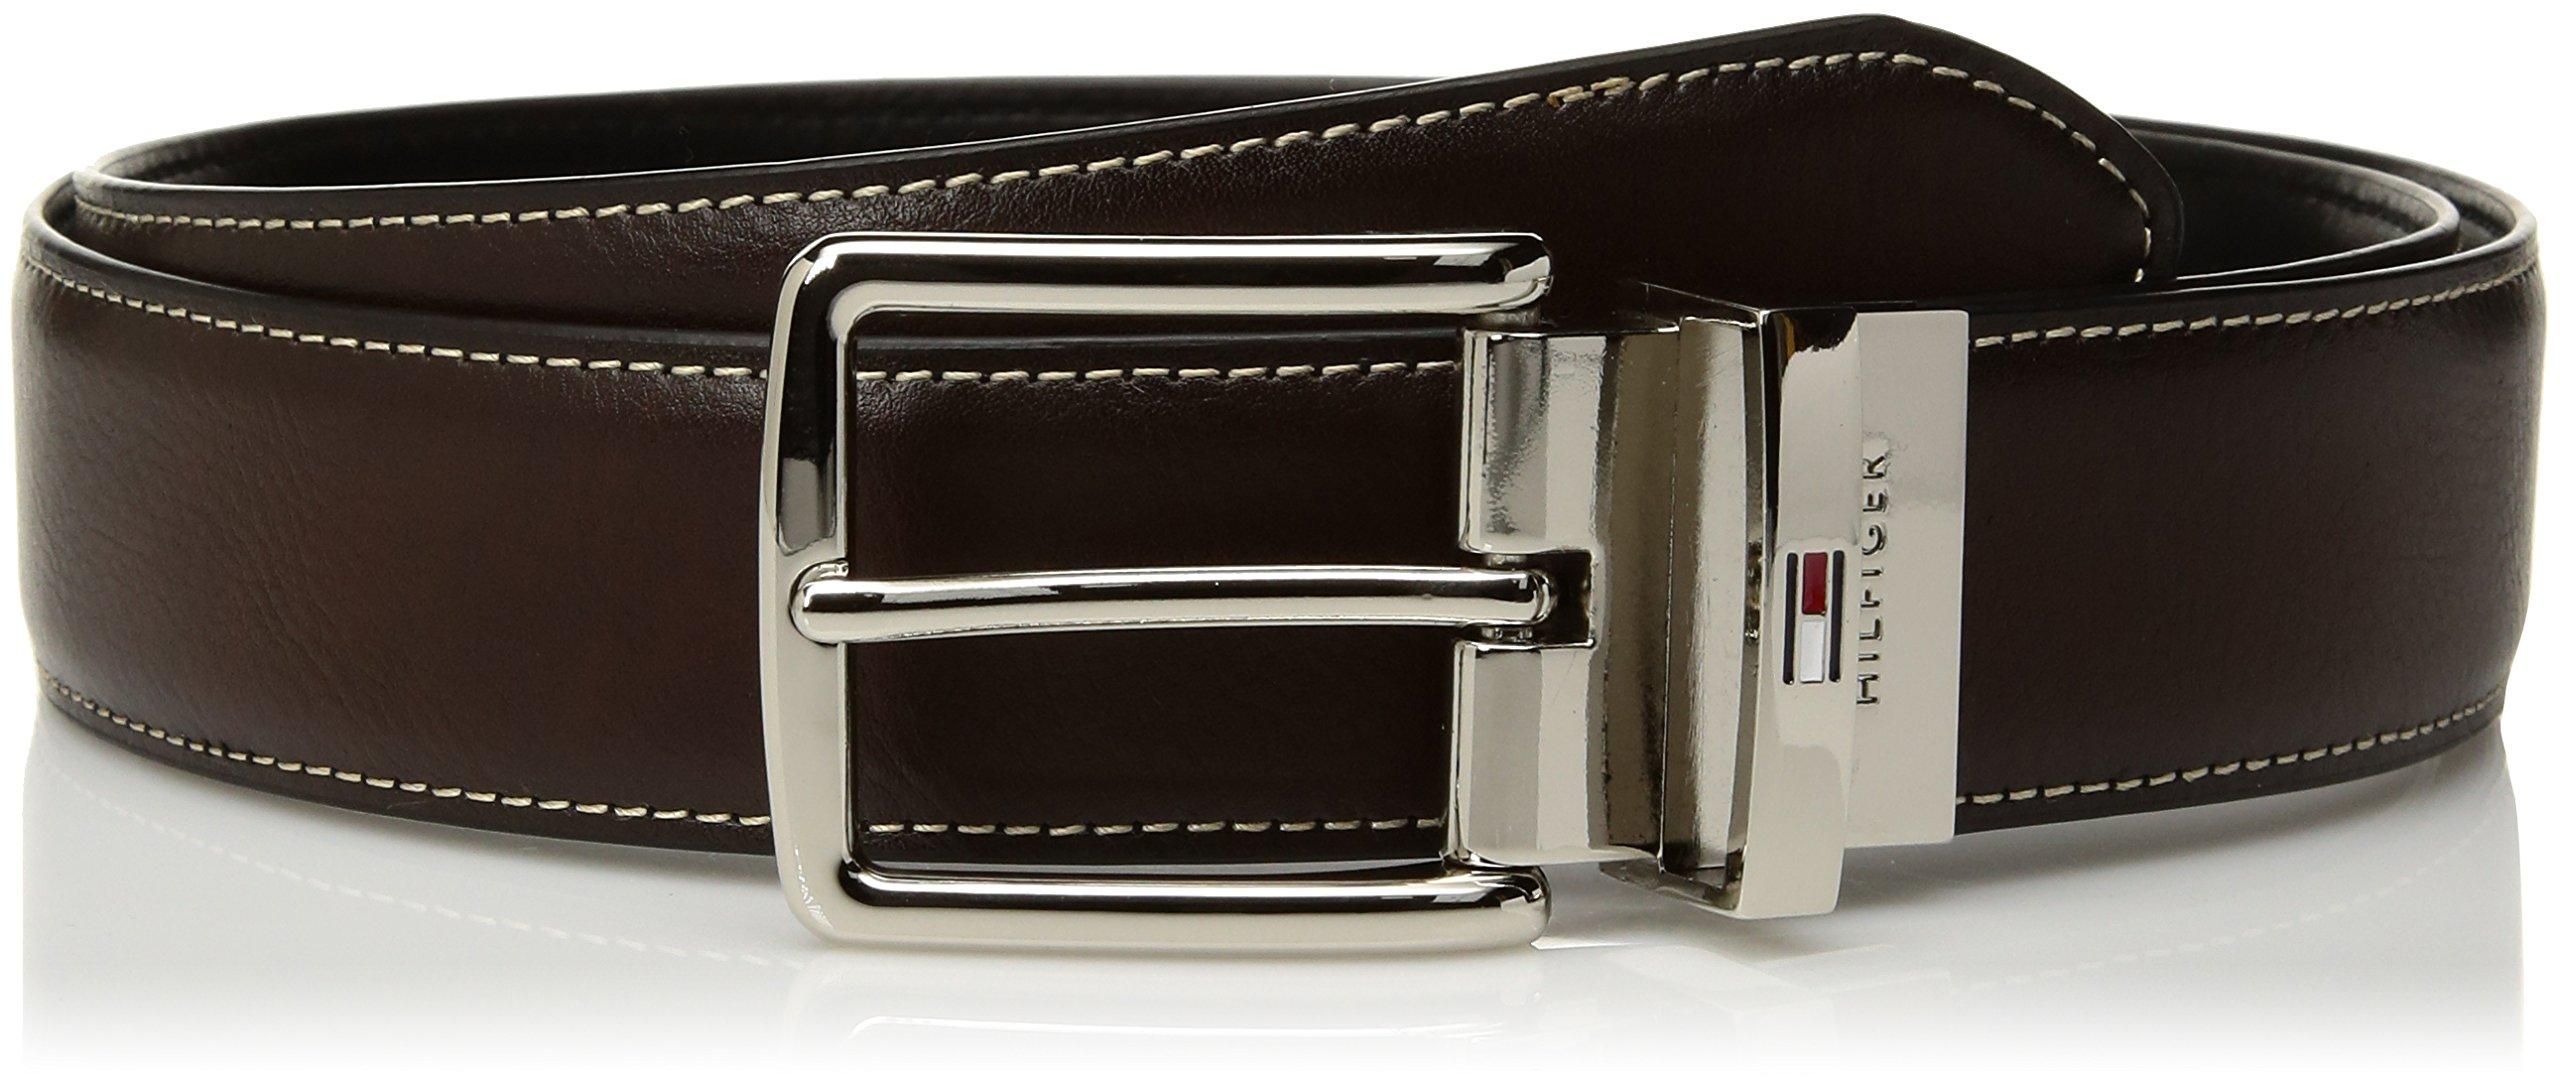 Tommy Hilfiger Men's Casual Reversible Belt, tan/black, 34